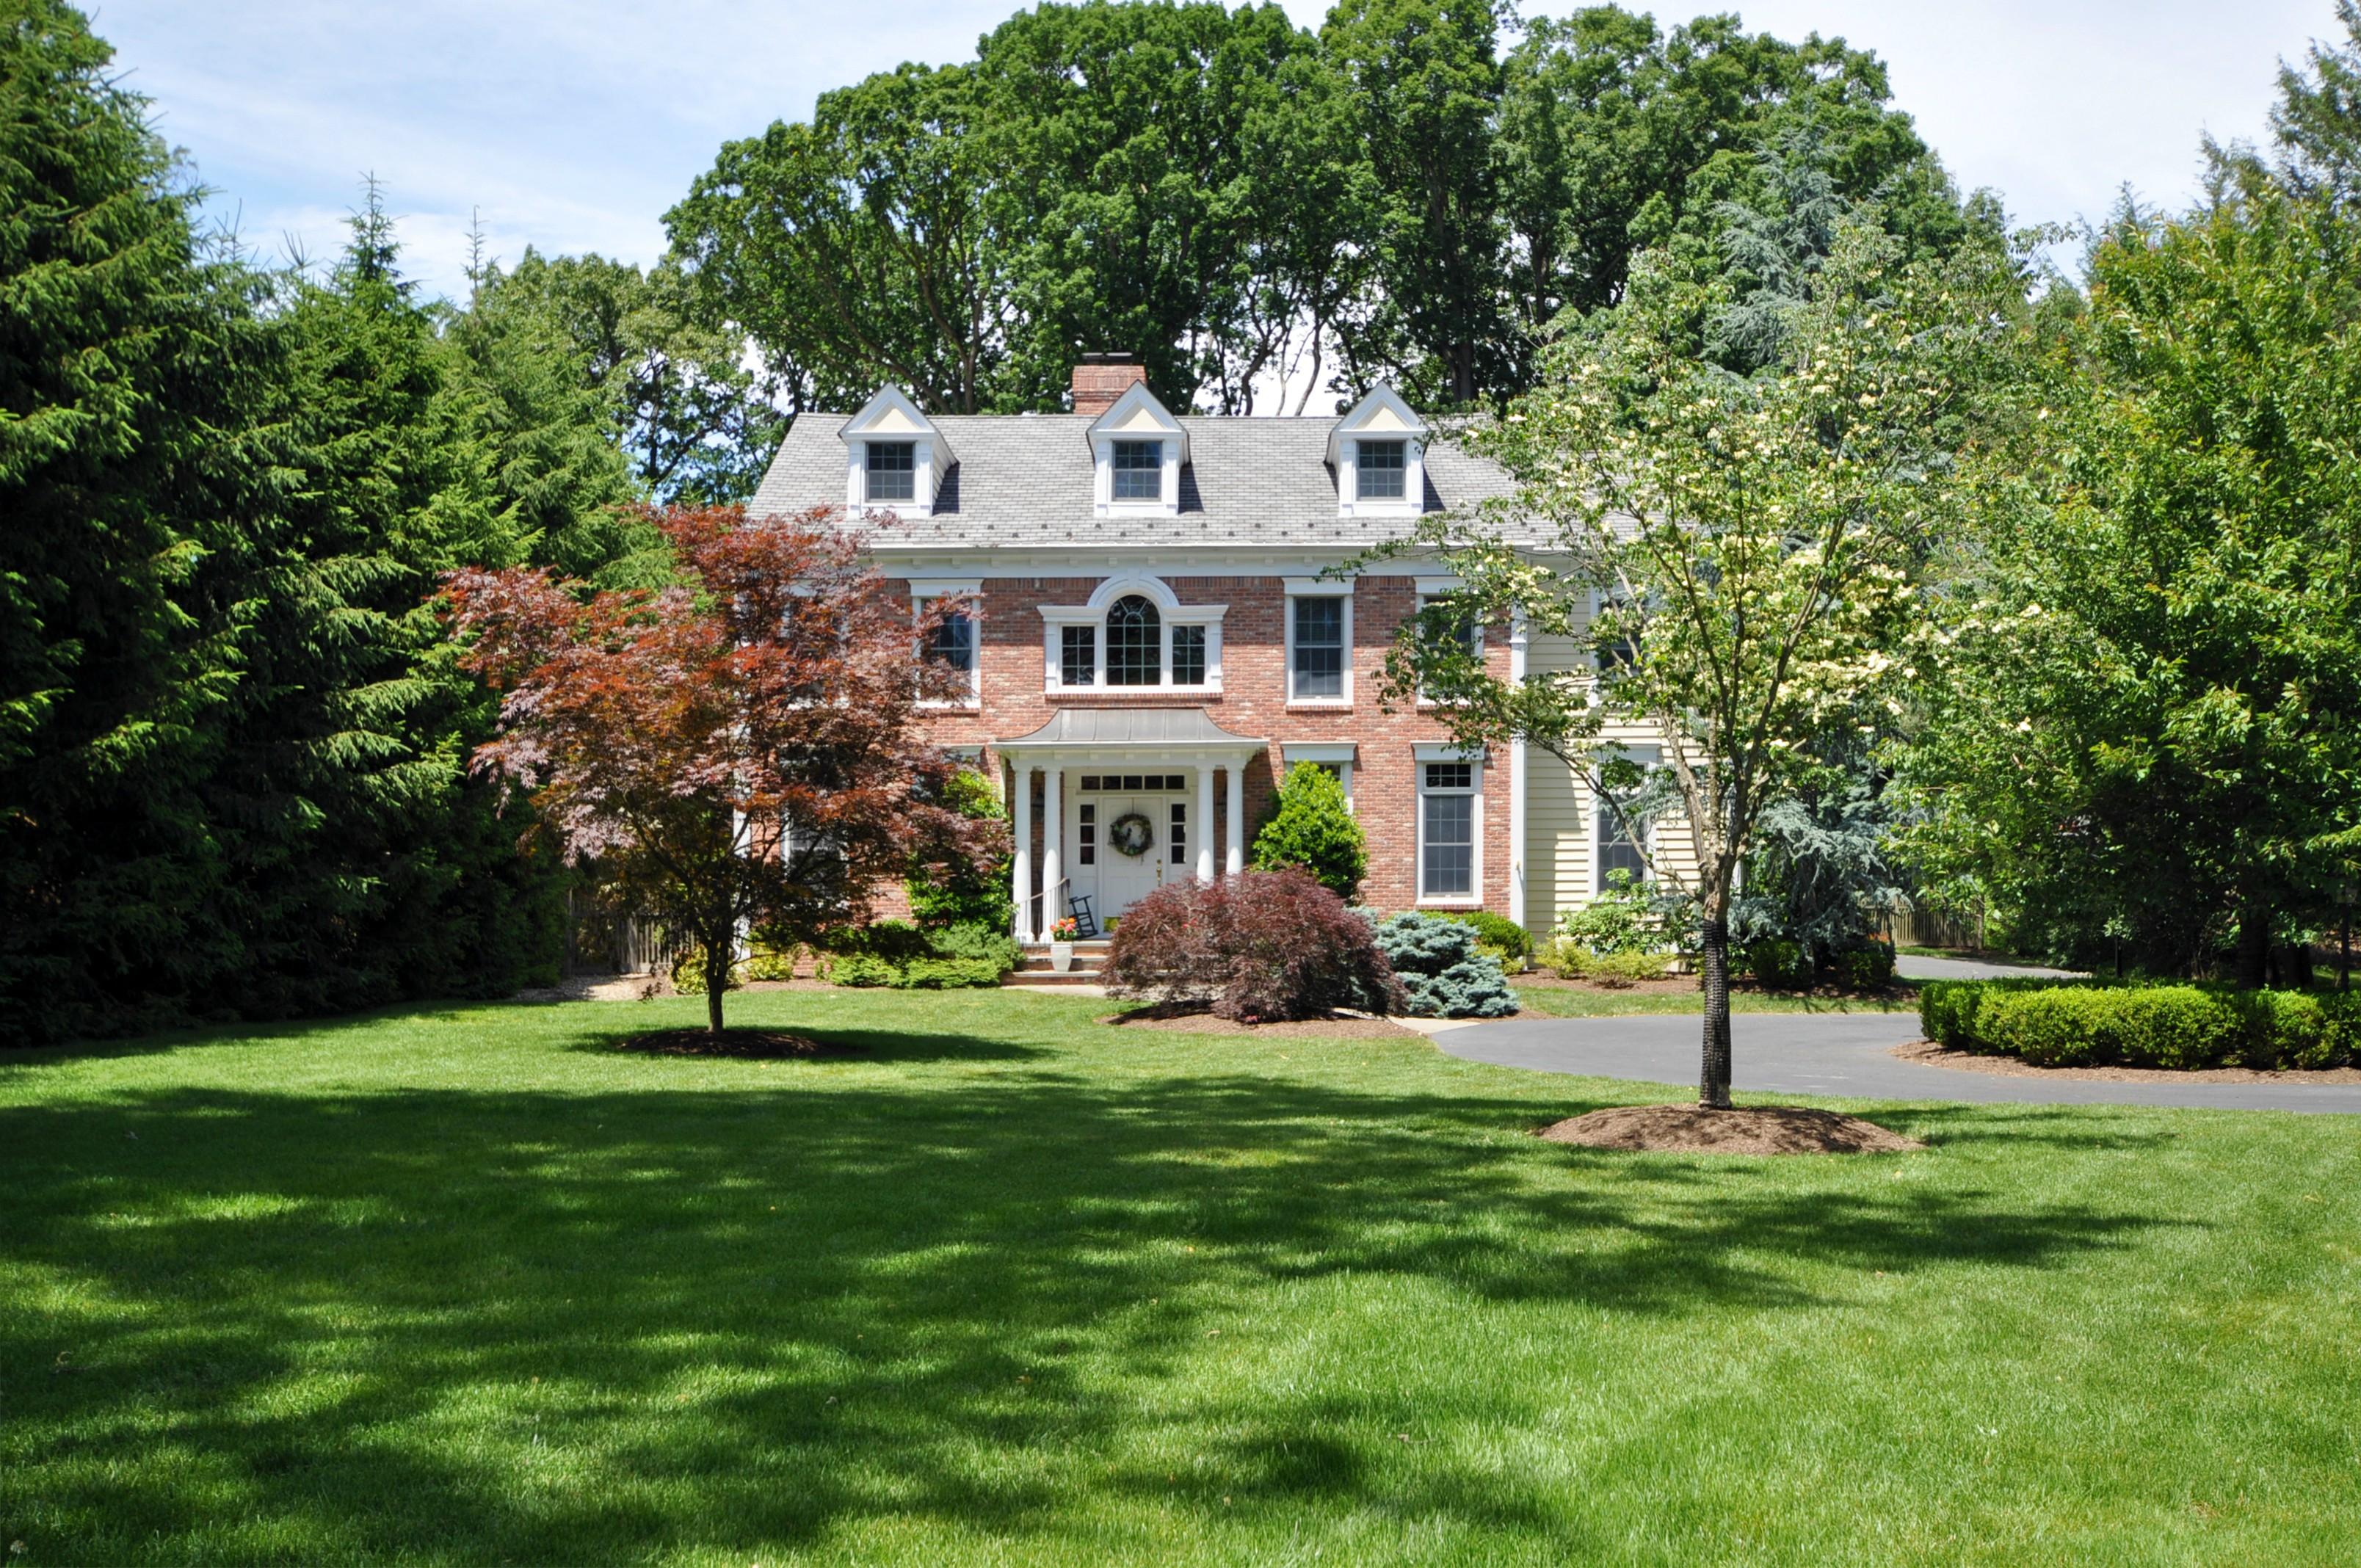 独户住宅 为 销售 在 Fabulous Center Hall Colonial 242 Lafayette Avenue 查塔姆, 新泽西州, 07928 美国